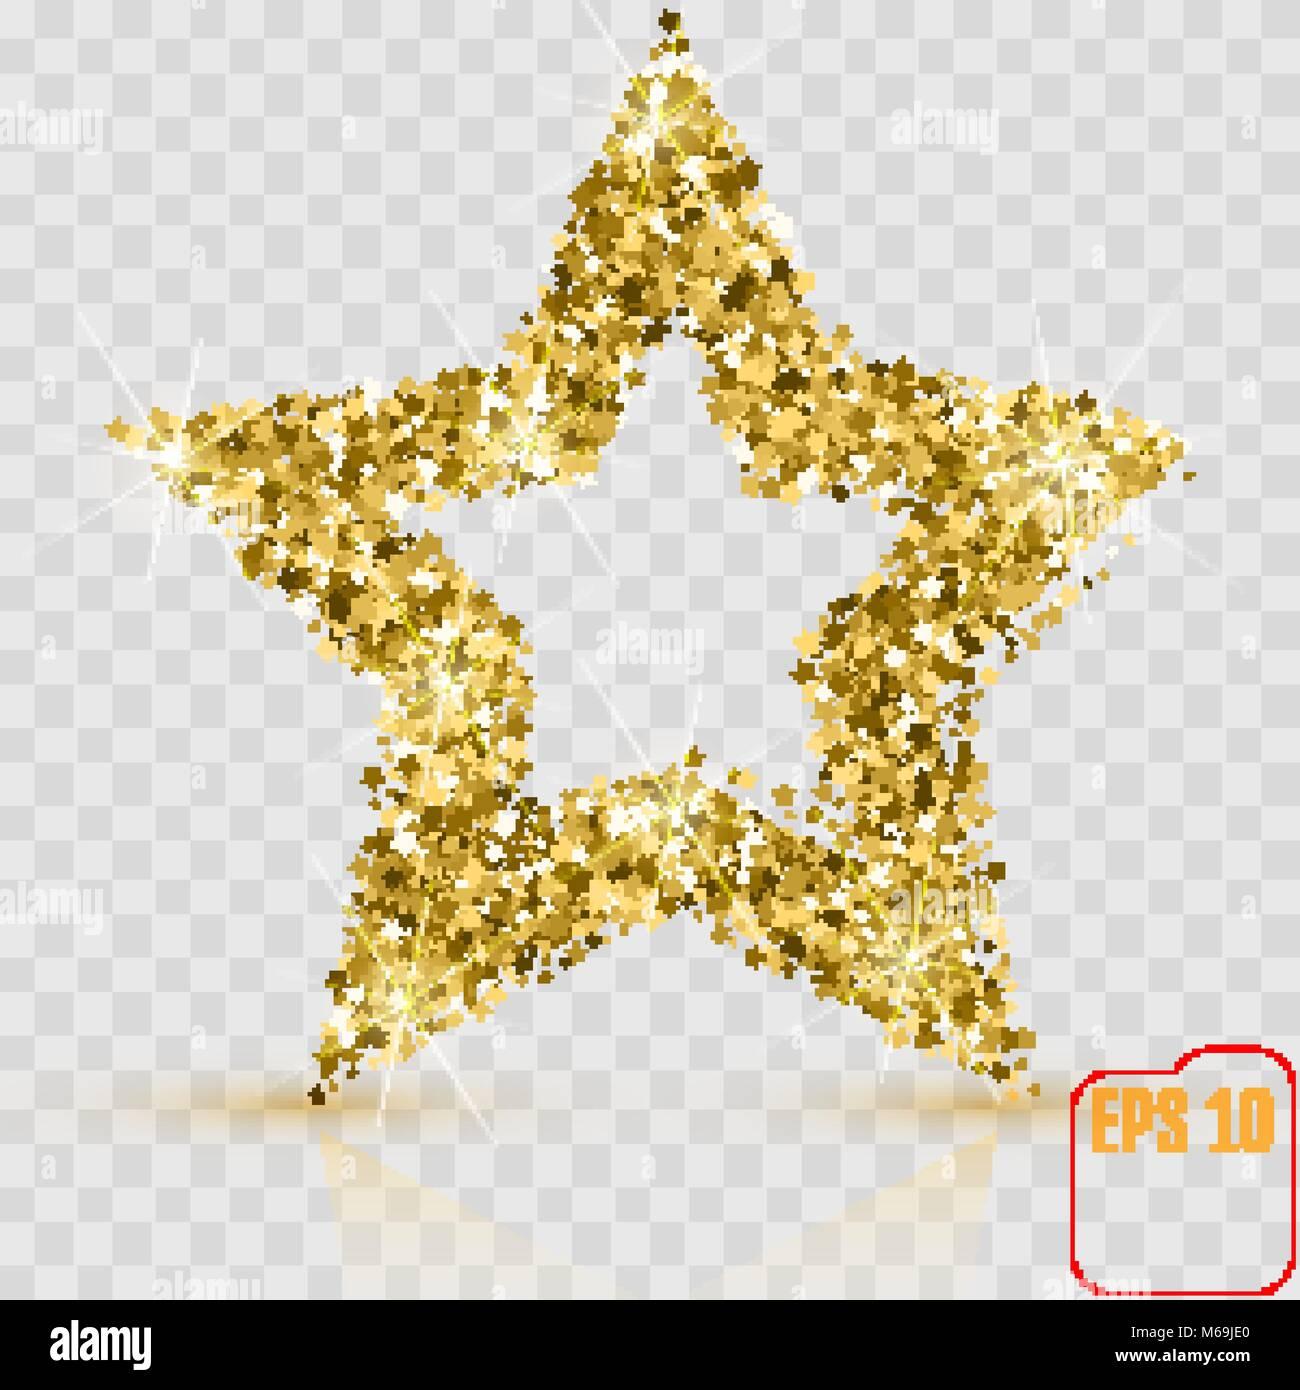 Magnificent Stern Student Zertifikatvorlage Embellishment ...